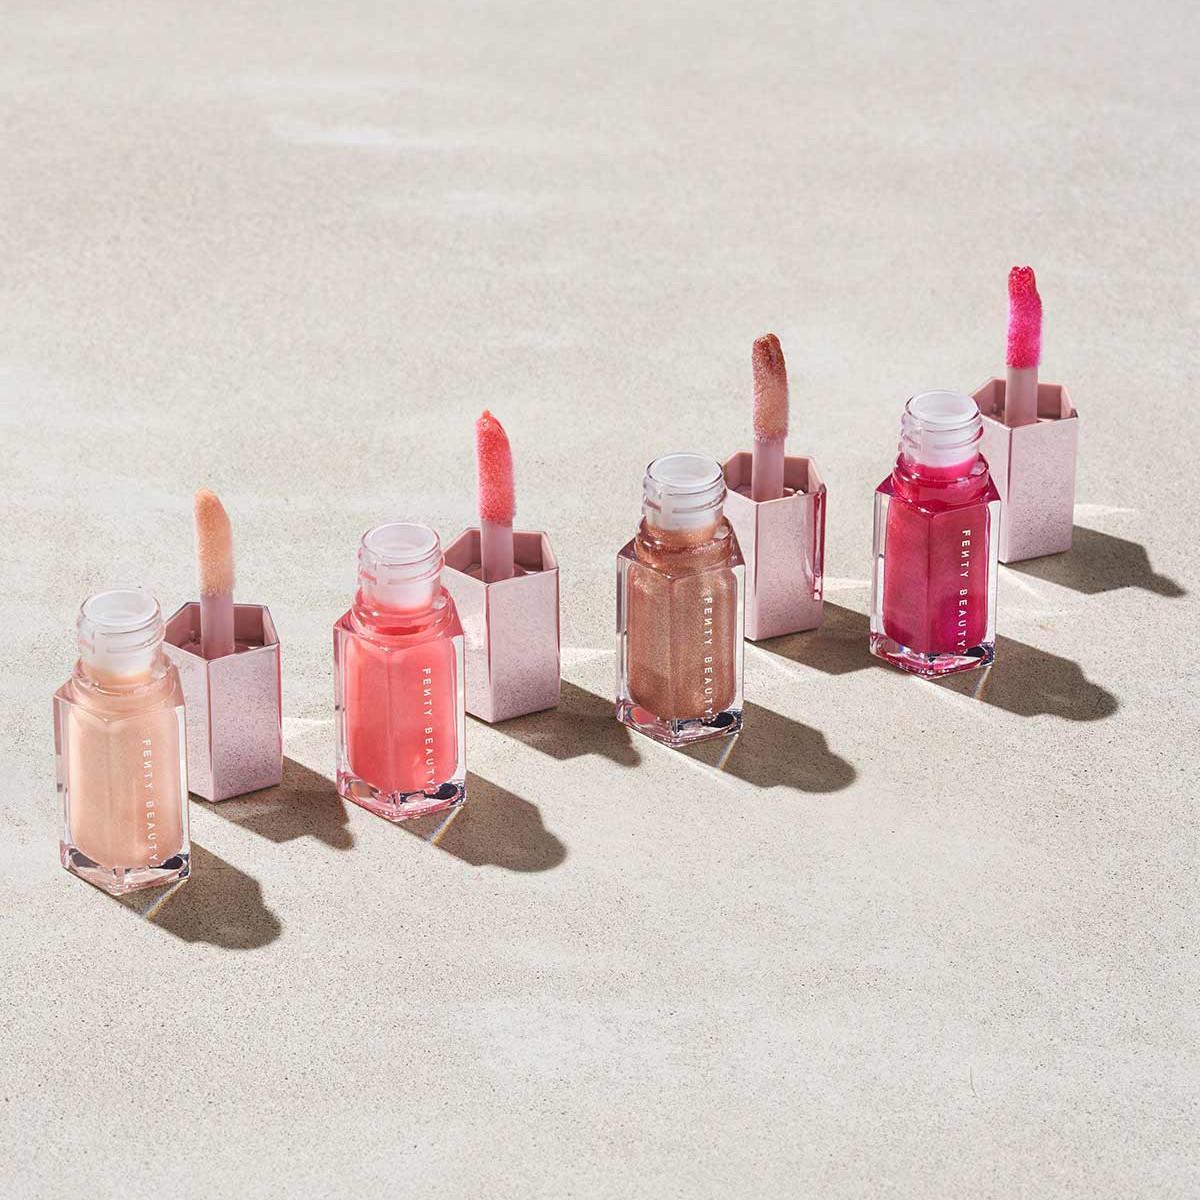 Glossy Posse Holo'daze Edition Mini Gloss Bomb Collection Open